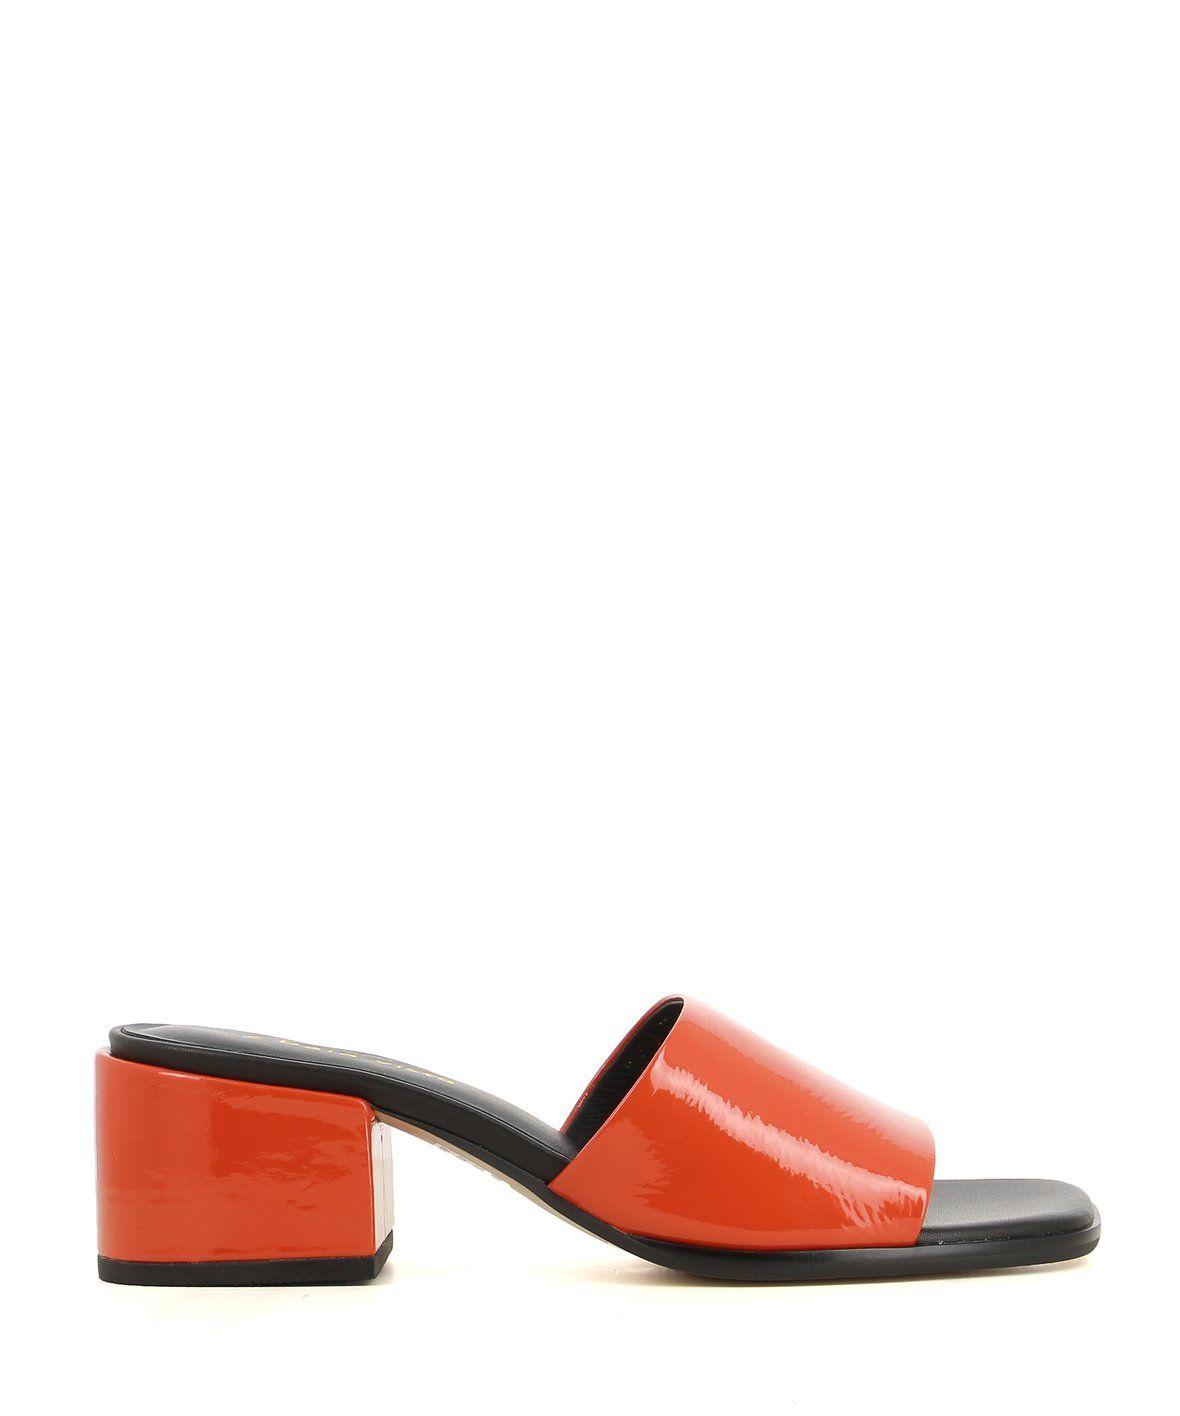 2 Baia Vista Vela Orange Patent Zomp Shoez In 2020 With Images Leather Mules Heeled Mules Patent Leather